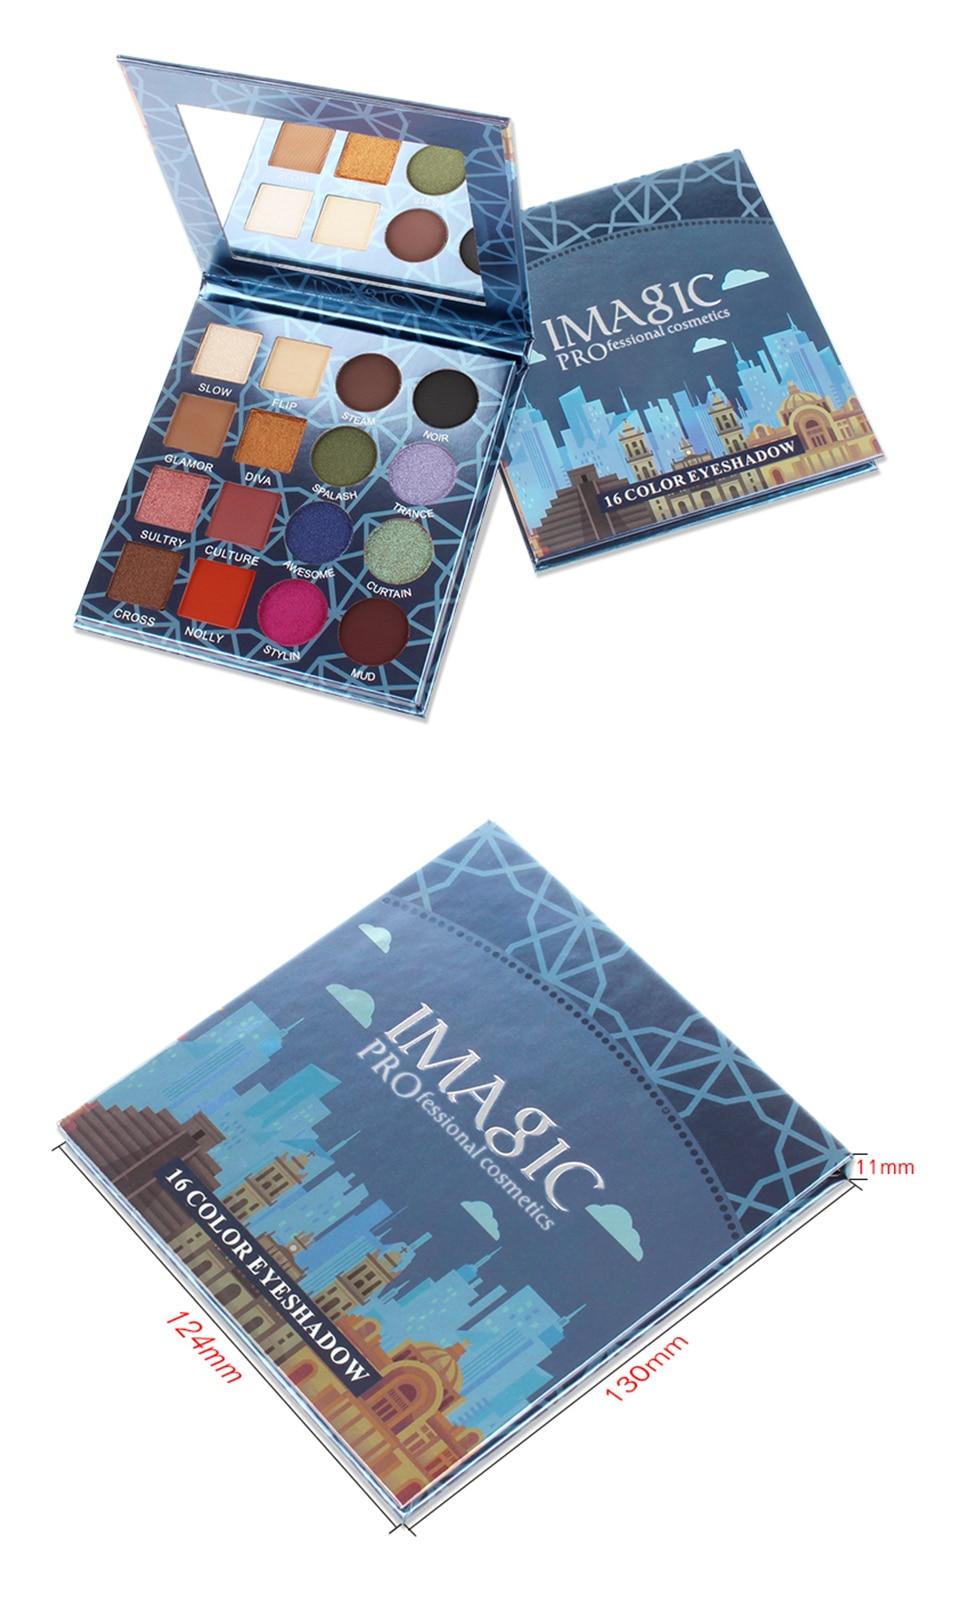 Charming Shimmer Eyeshadows 16 Colors Set